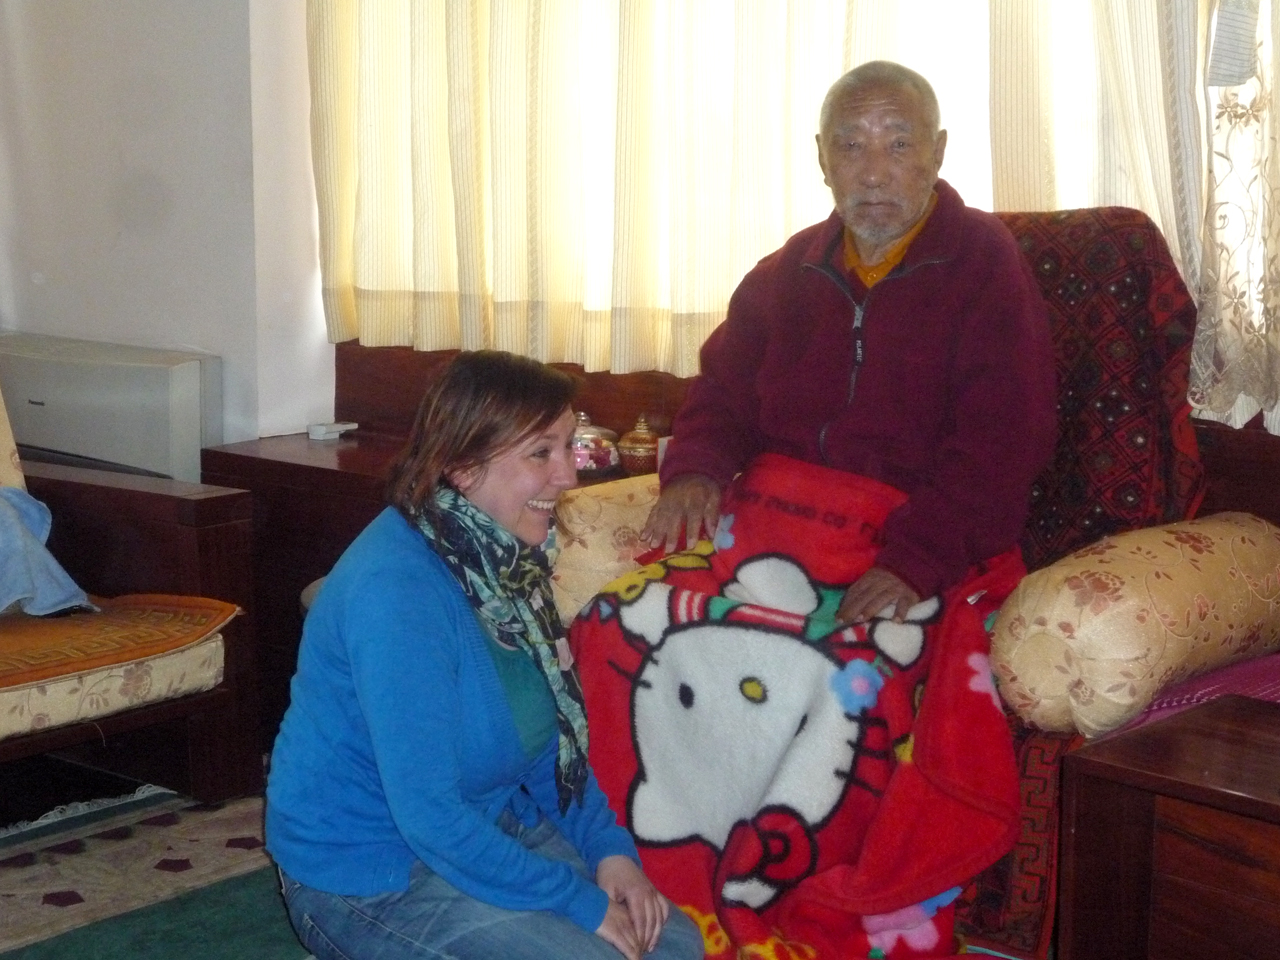 kristina_bischoff_and_Khenpo_Tsultrim_Gyamtso_Rinpoche